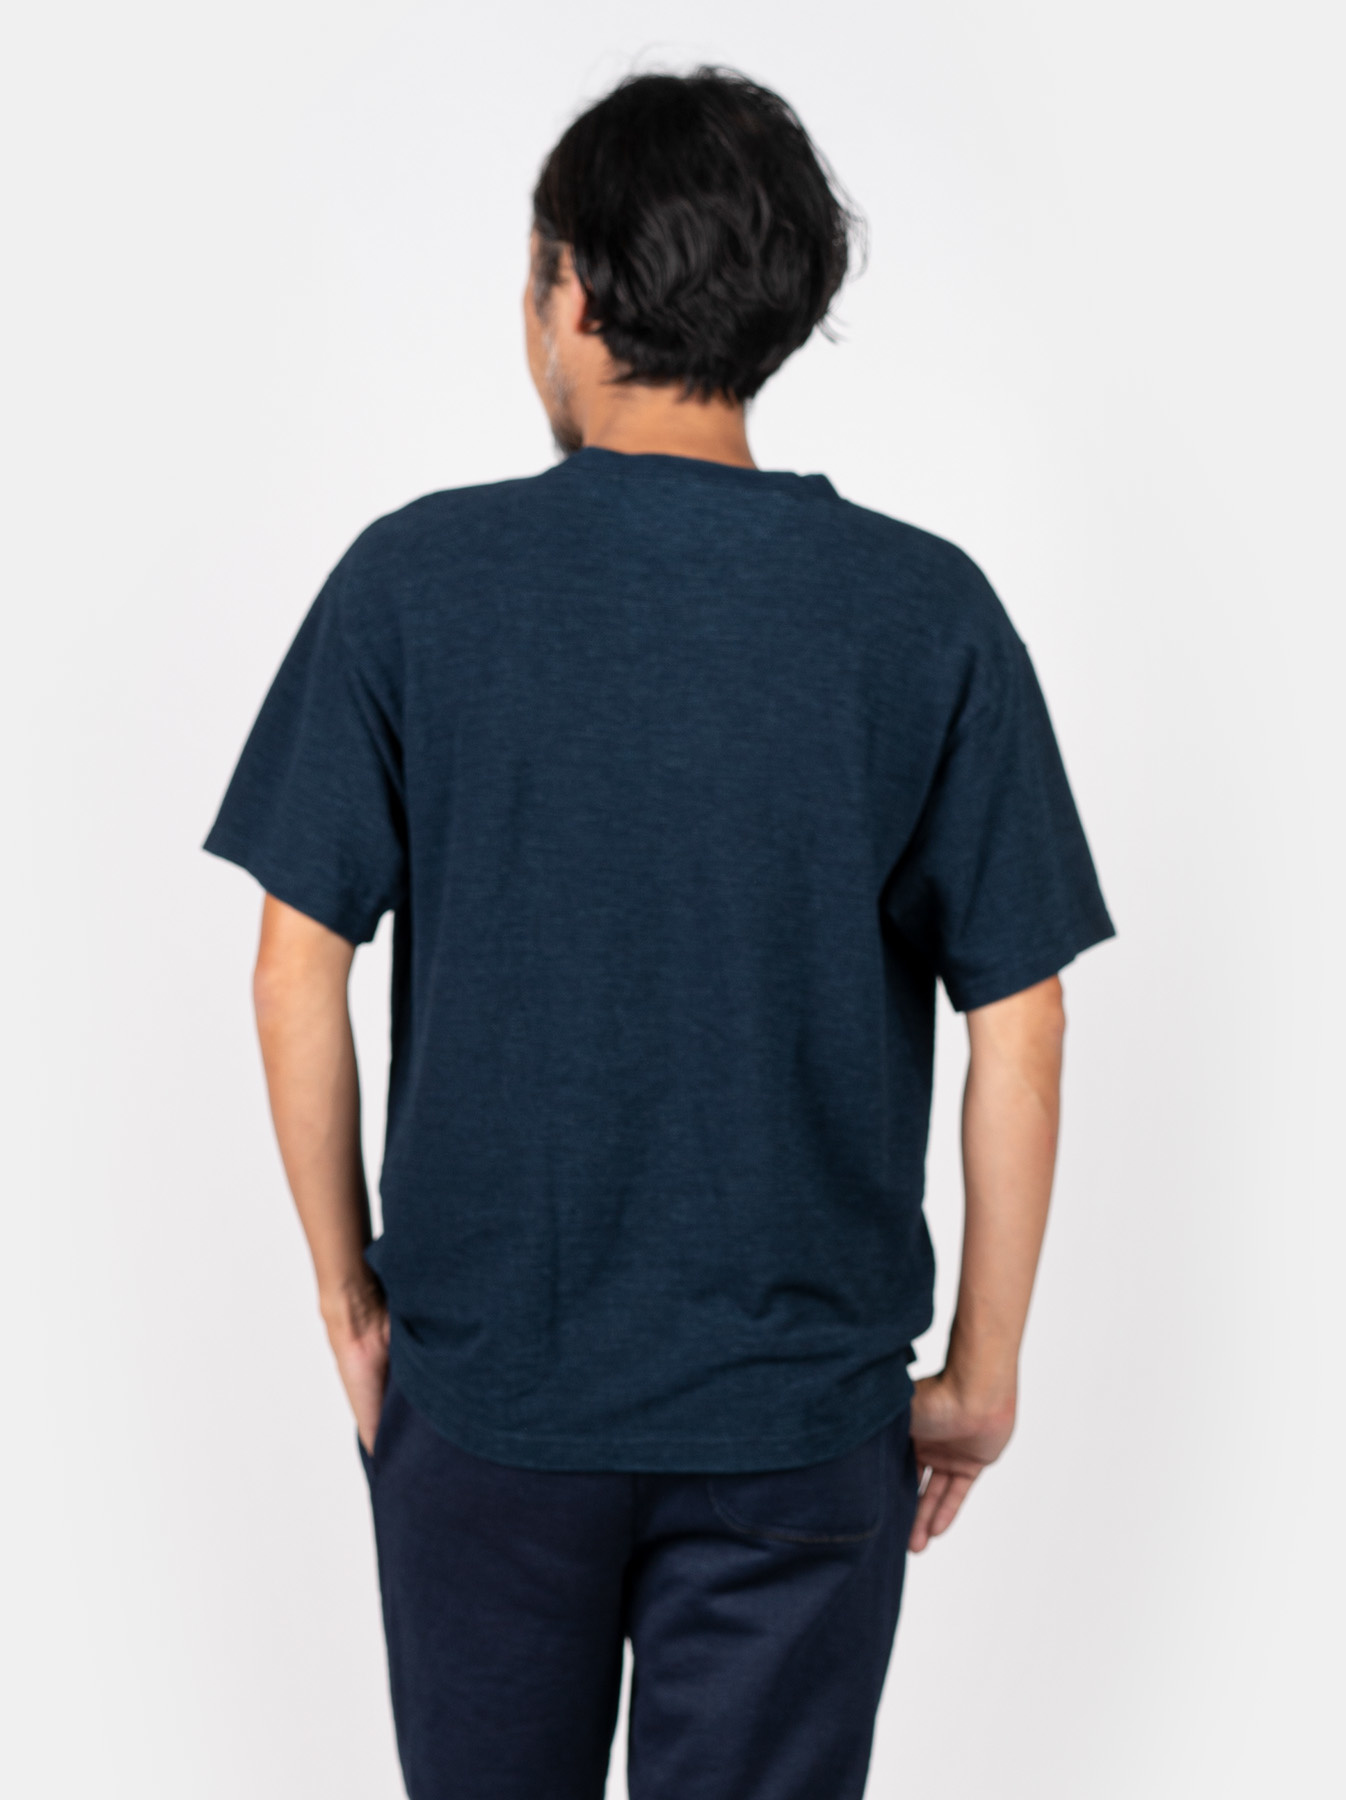 WH Indigo Ultimate Pique T-shirt-5